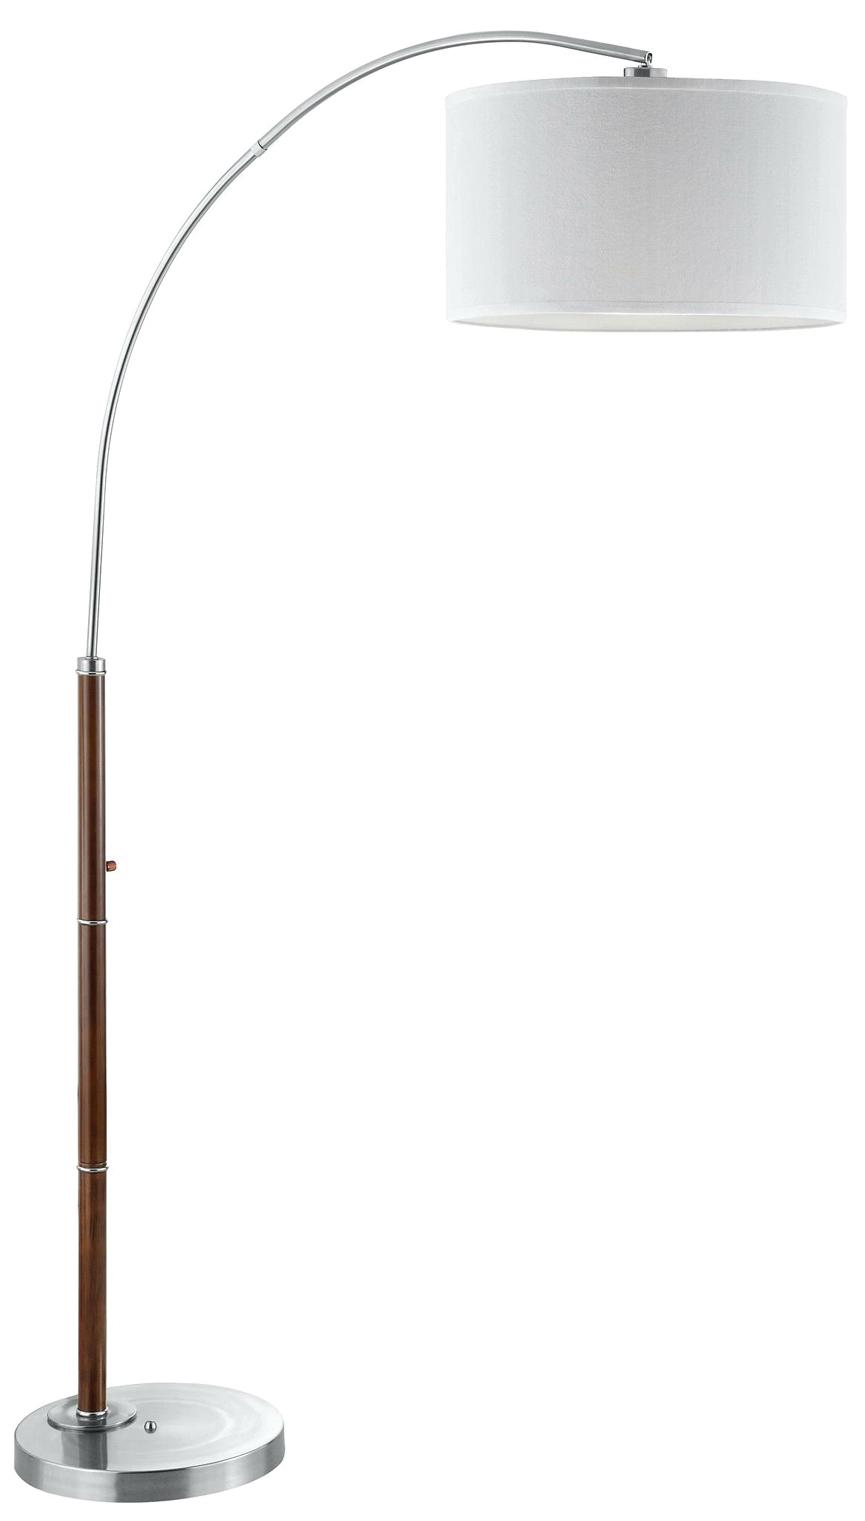 opcion-2-lamp